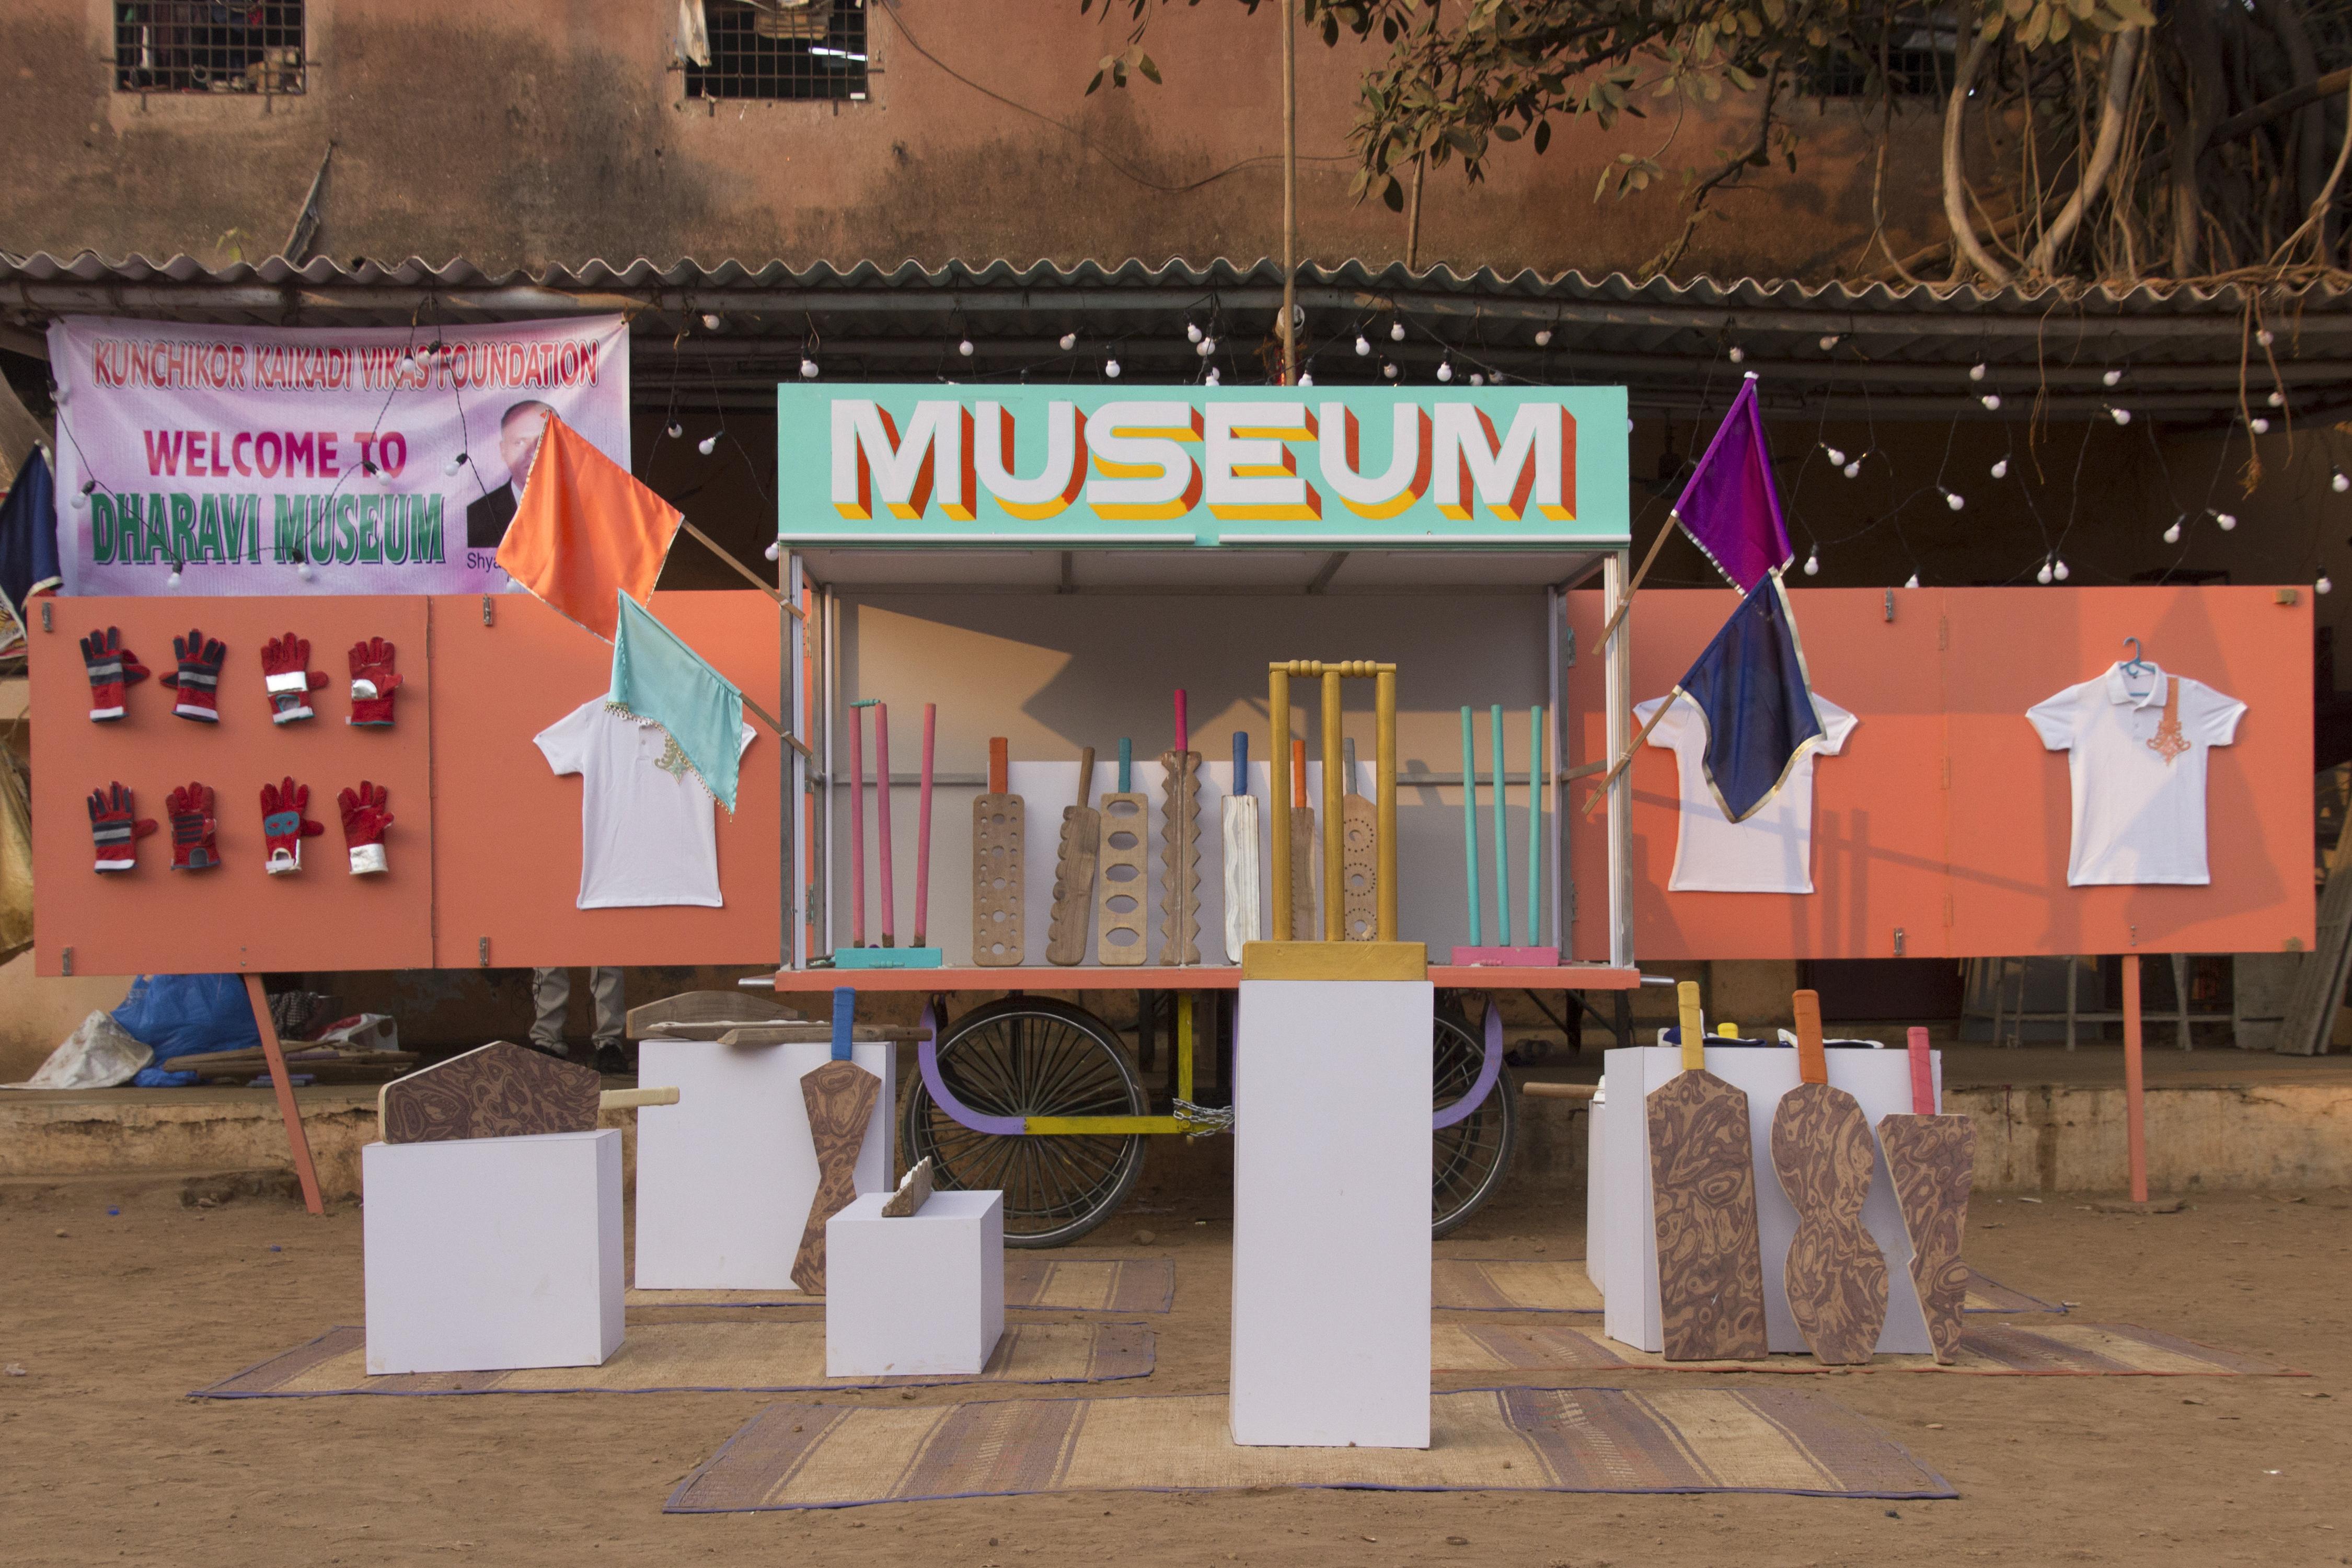 Jorge Mañes Rubio and Amanda Pinatih, Design Museum Dharavi. 2016.  Photo: Courtesy the designers.